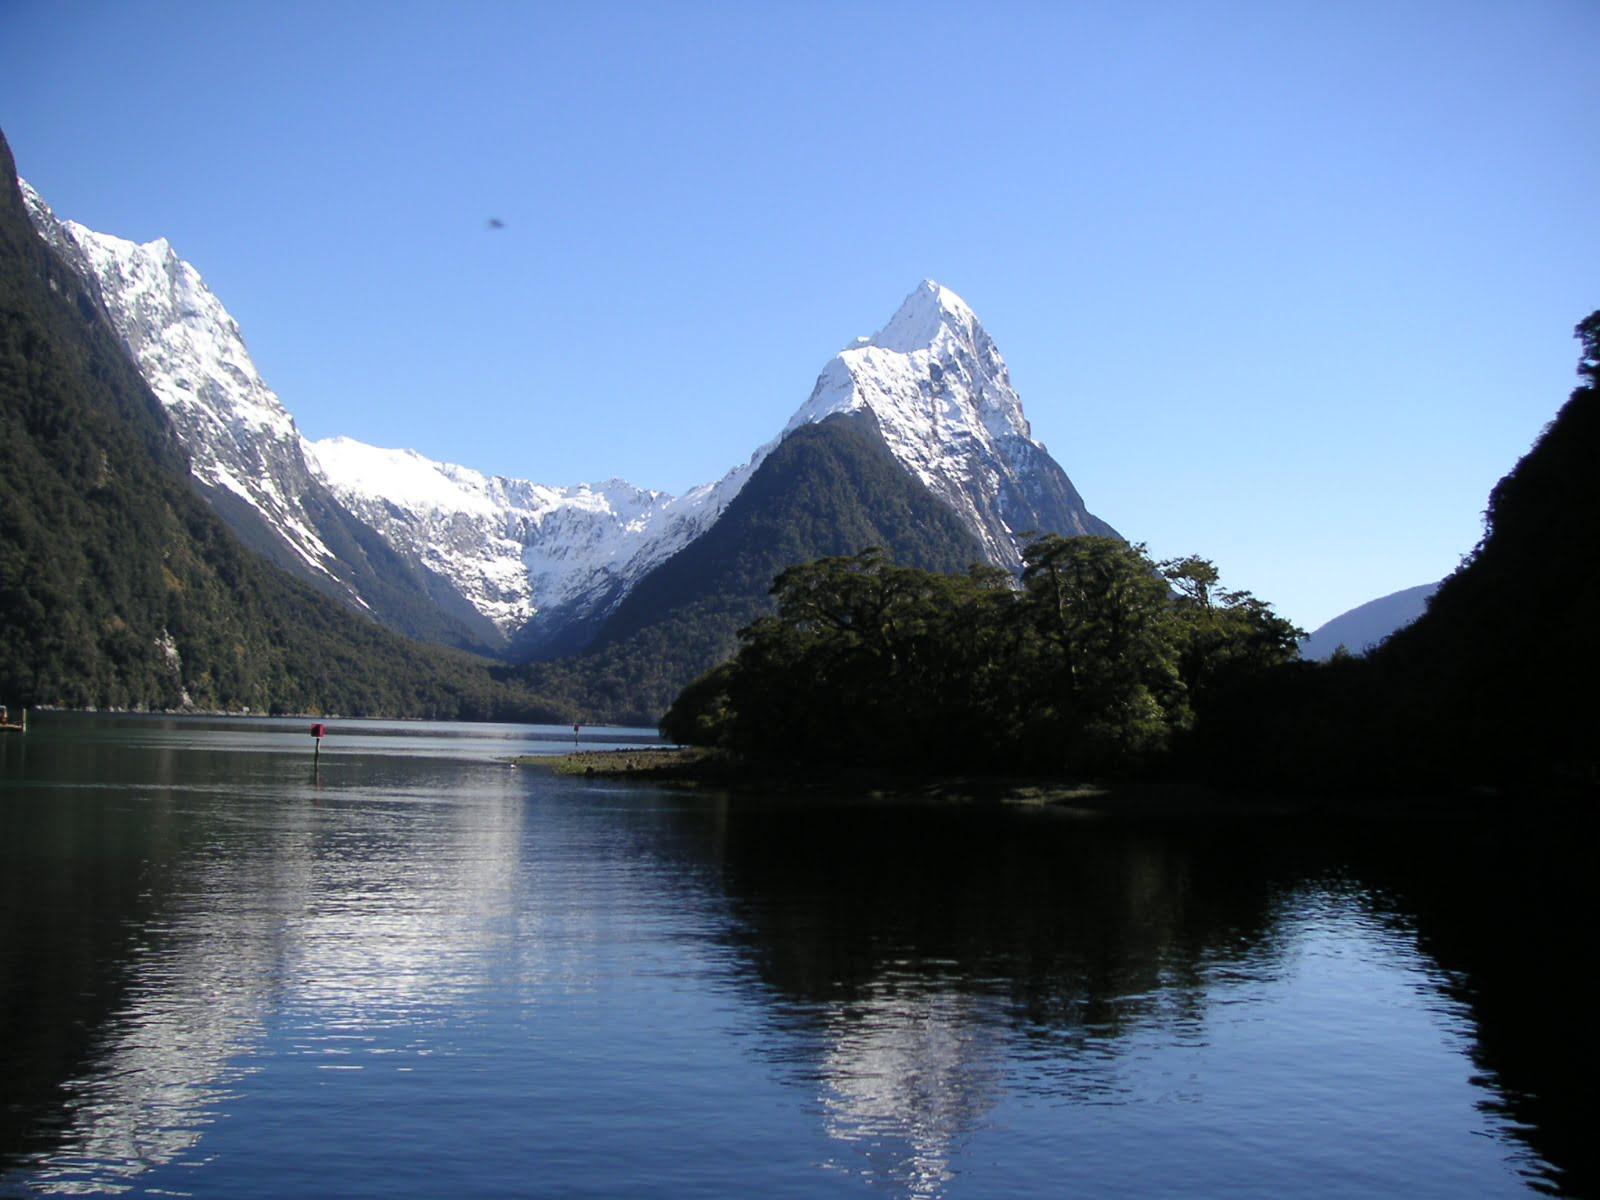 Milford Sound New Zealand - Beautiful mirrored waters